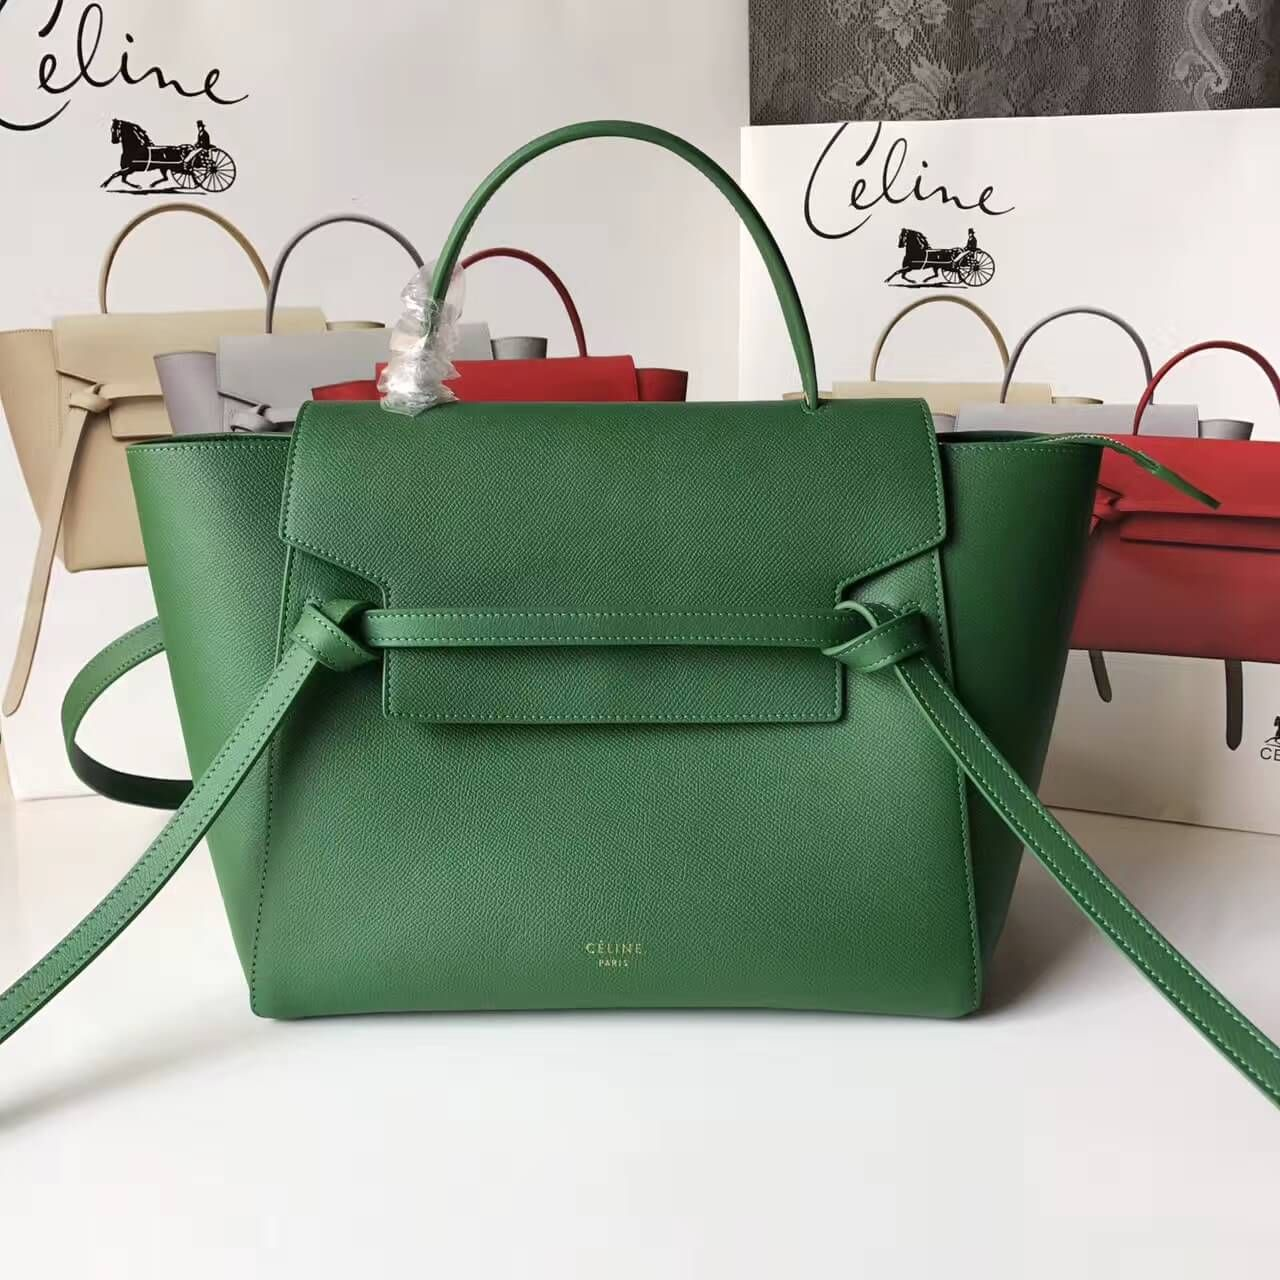 Celine Mini Belt Handbag 100% Authentic 80% Off  8b1cc130ed15d